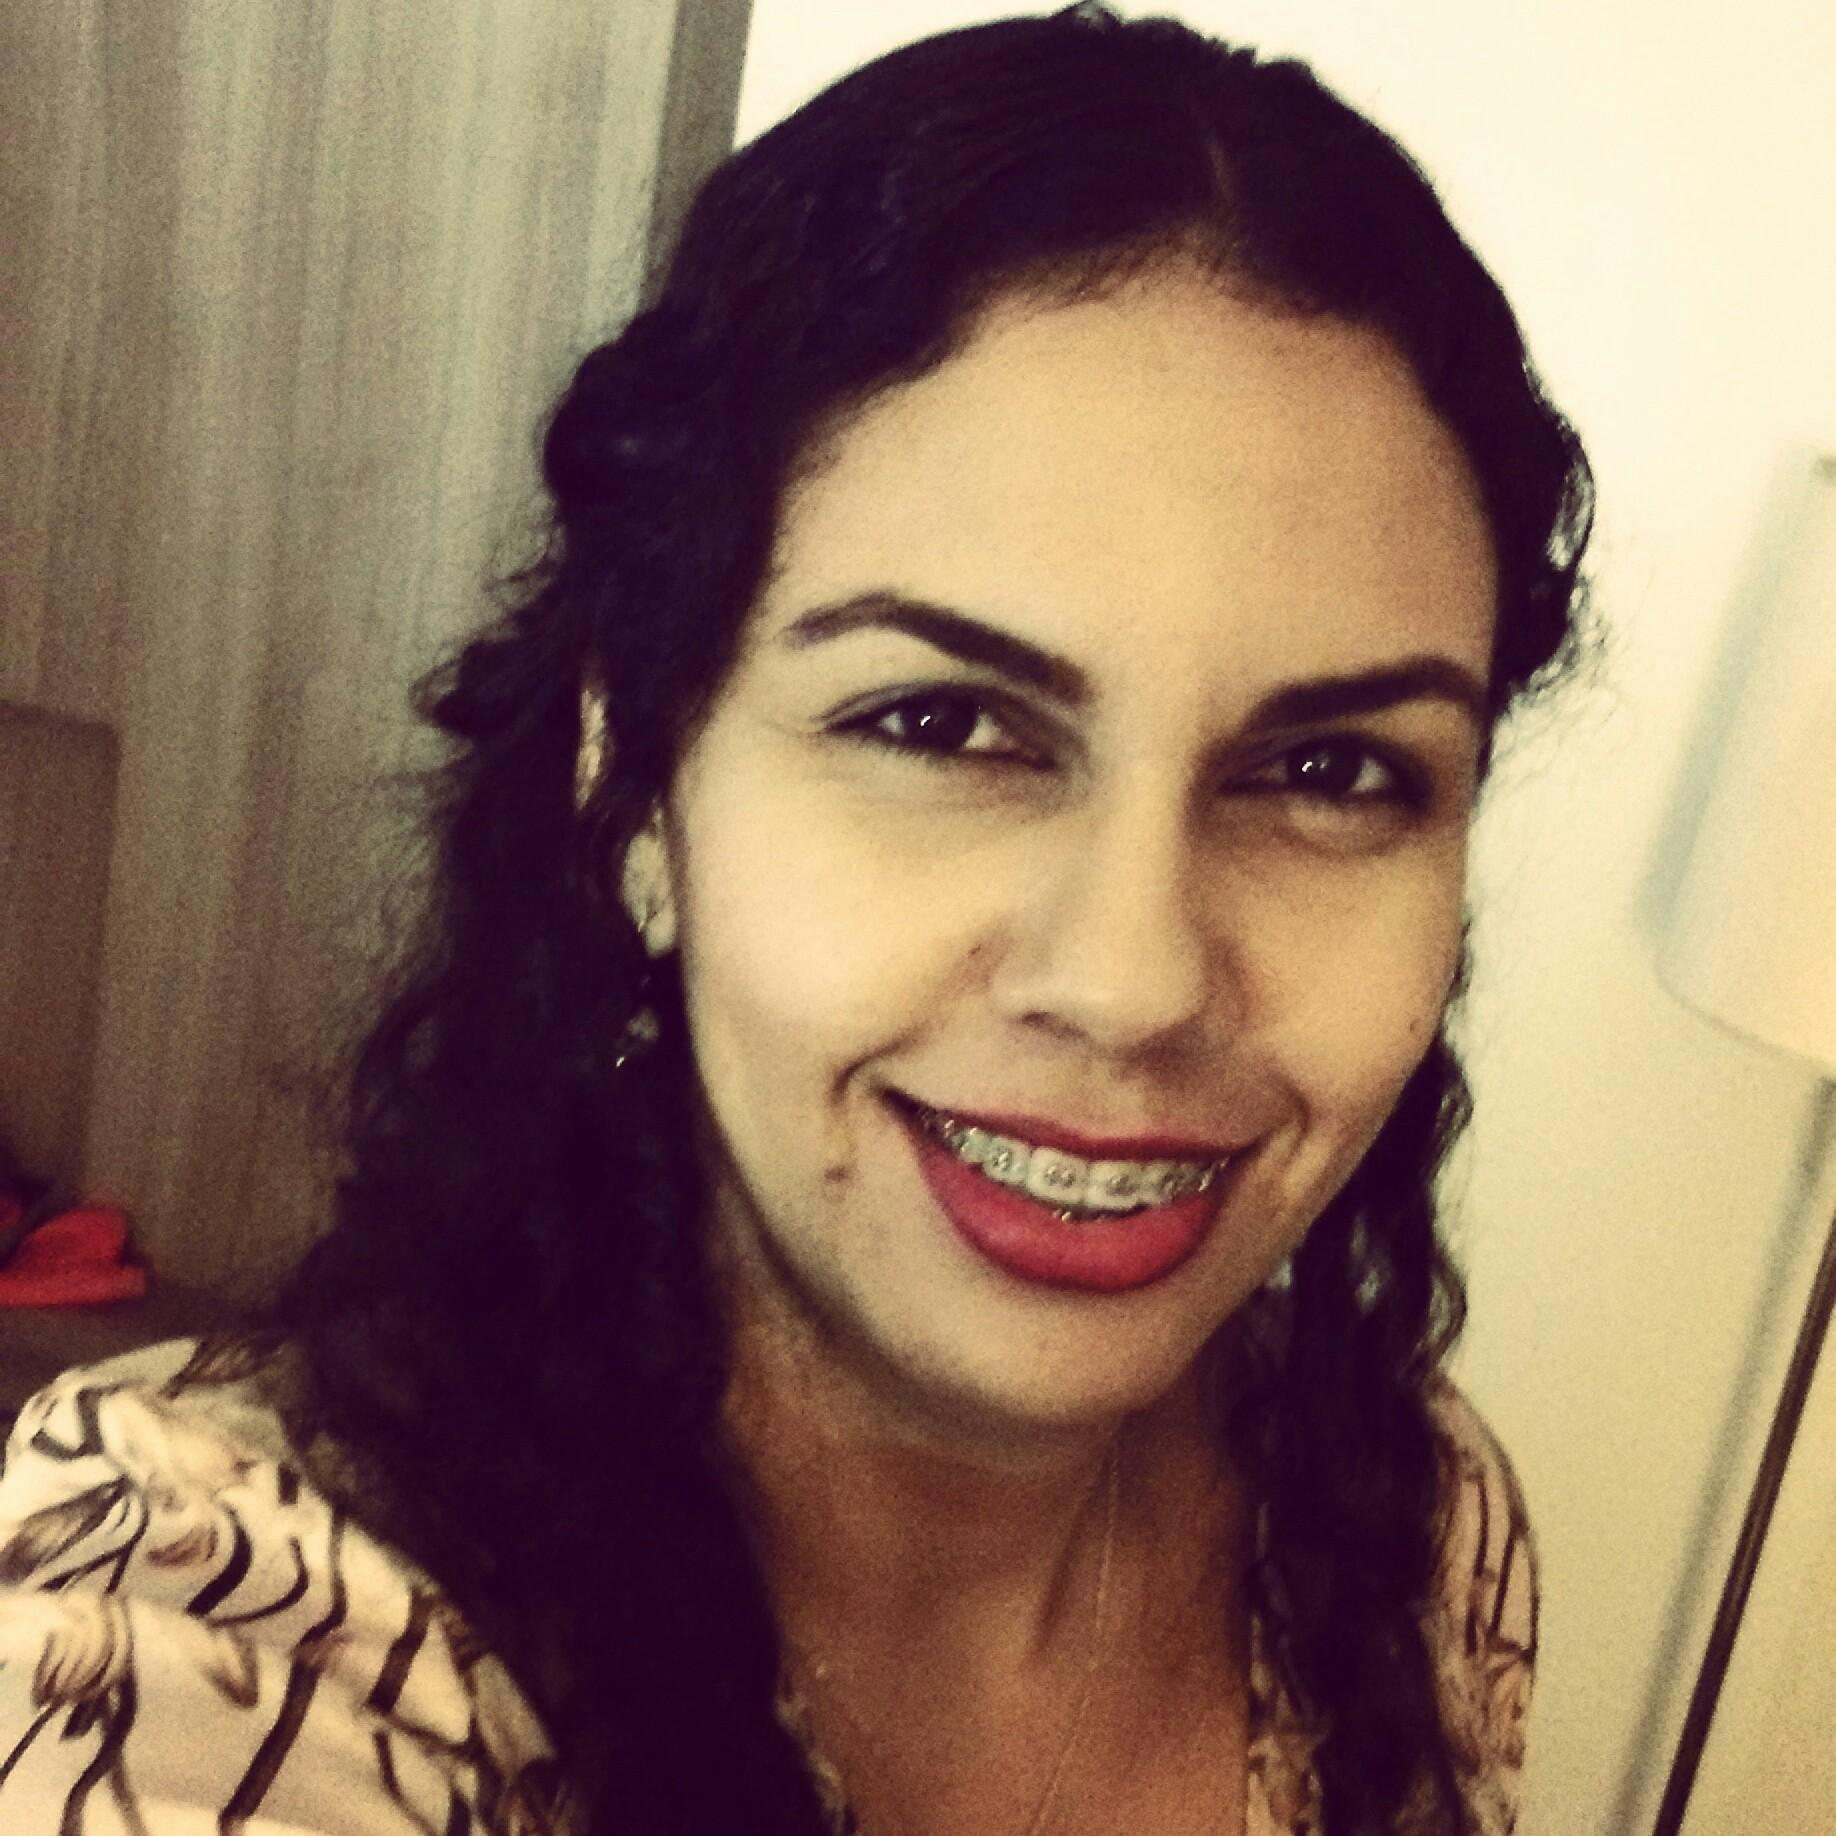 Ianne Nogueira